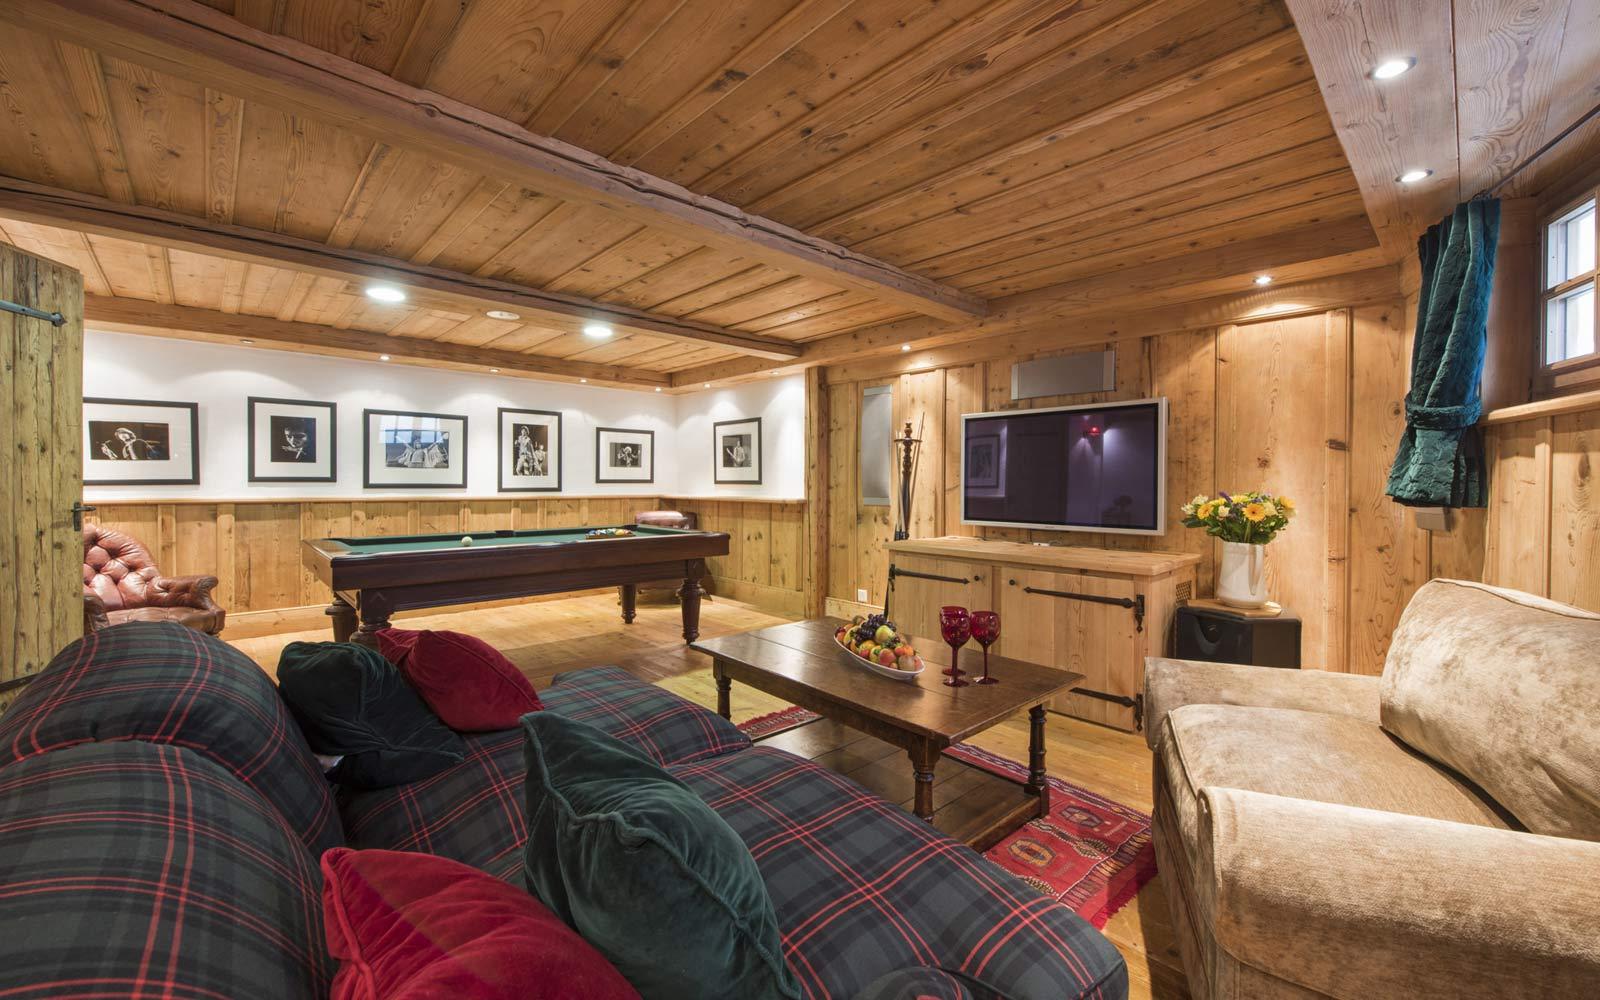 Chalet Rei - Alps Ski Resorts Chalet Rental In Swiss Alps - Aria ...